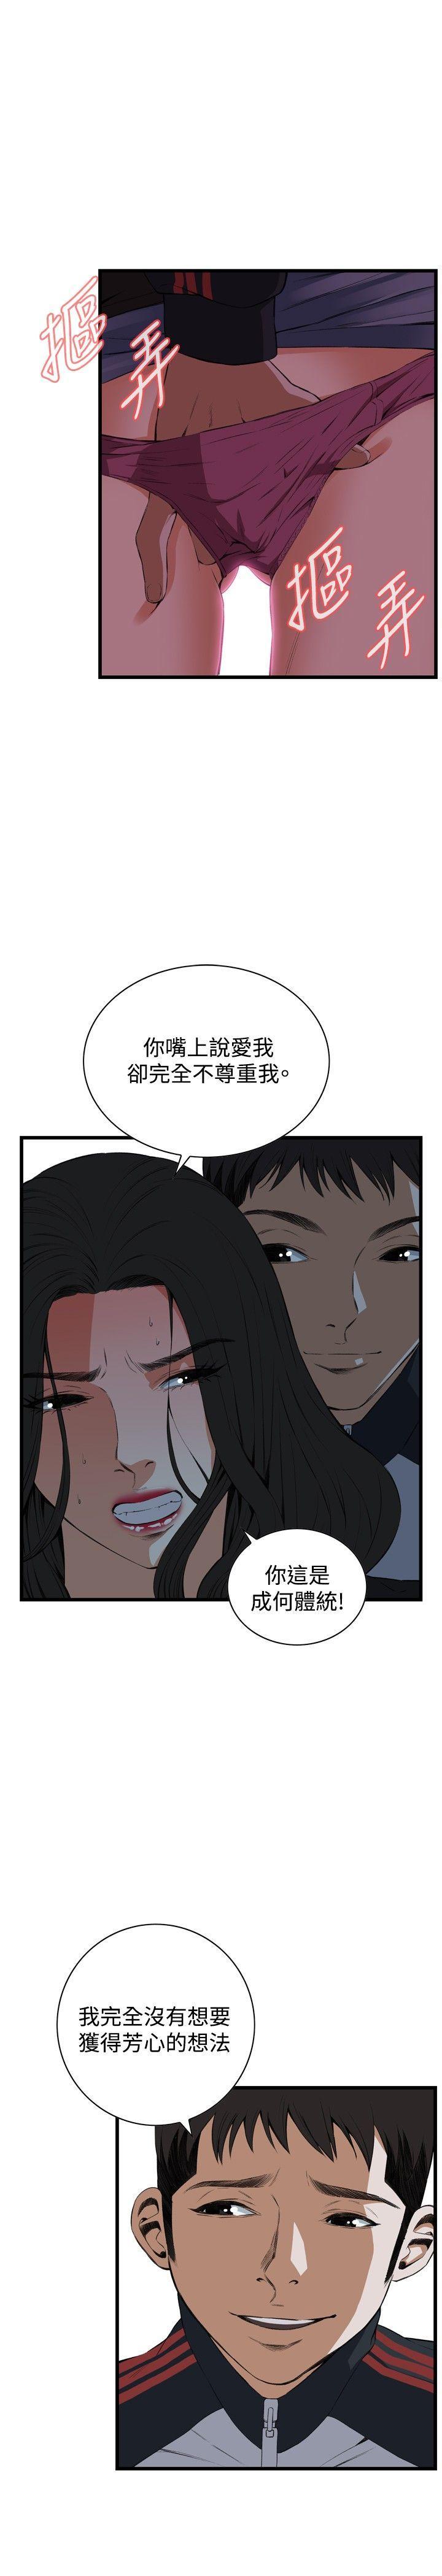 Take a Peek 偷窥 Ch.39~60 [Chinese]中文 568